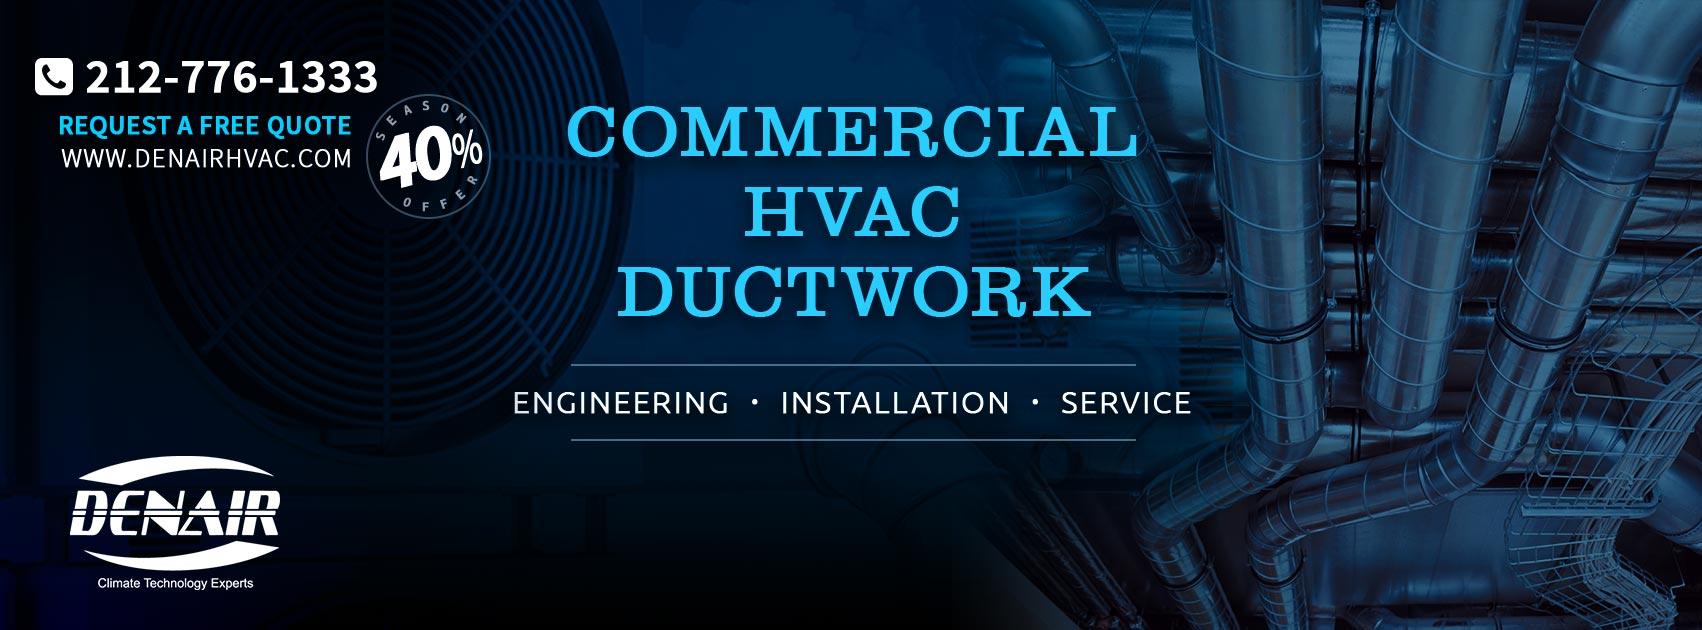 hight resolution of denair hvac equipment installation air conditioning company ductwork